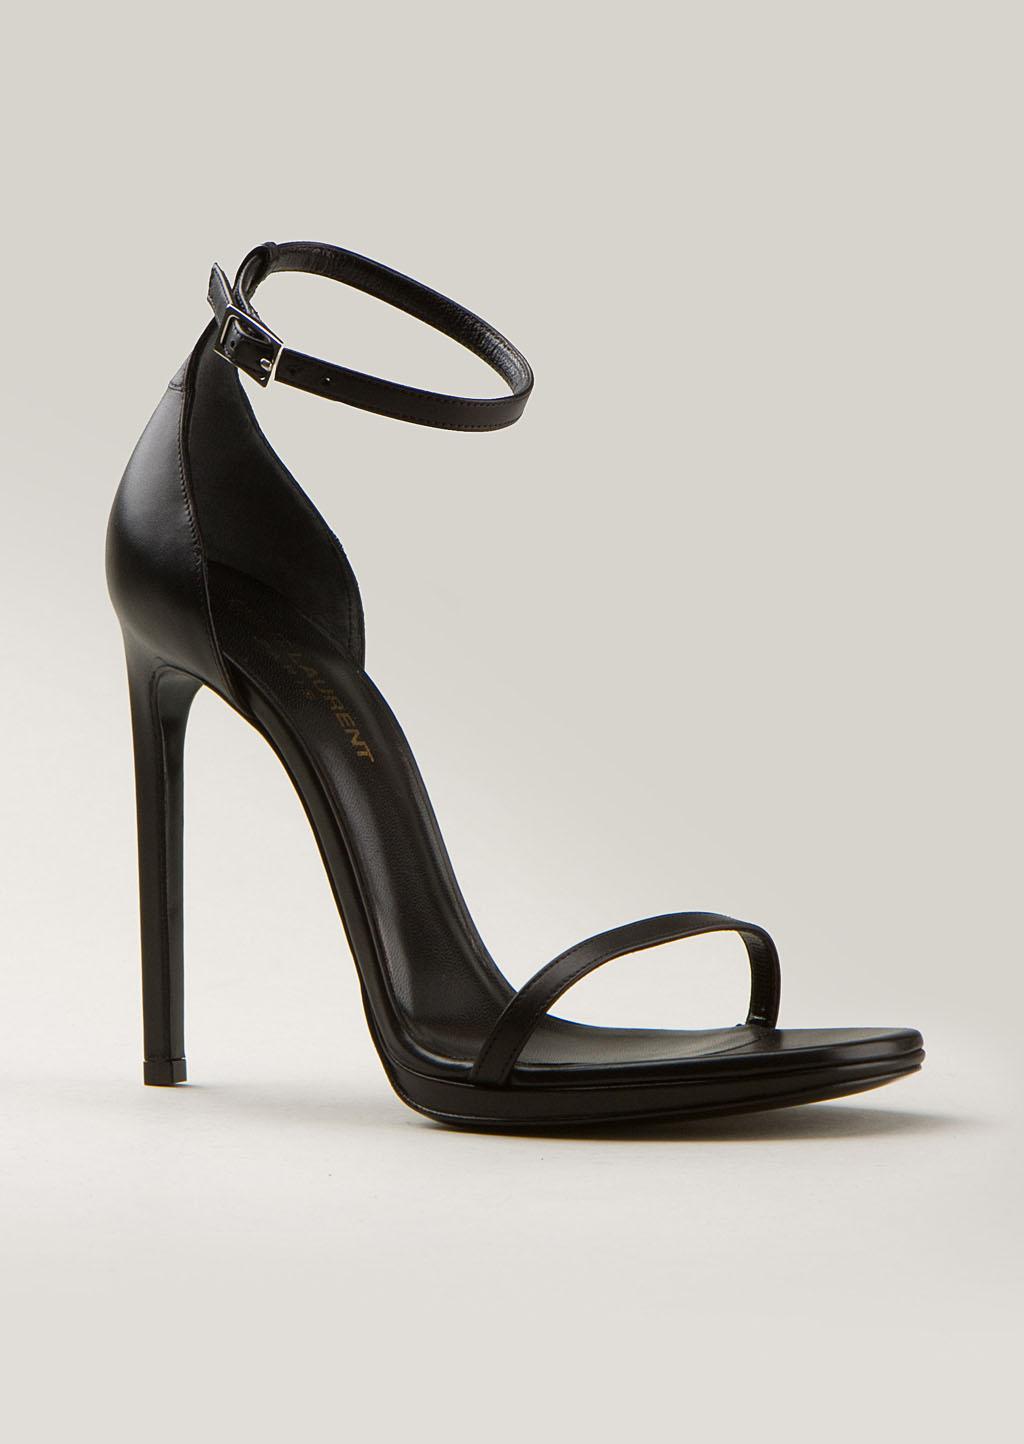 Saint Laurent Black Leather High Heels Sandals In Black Lyst